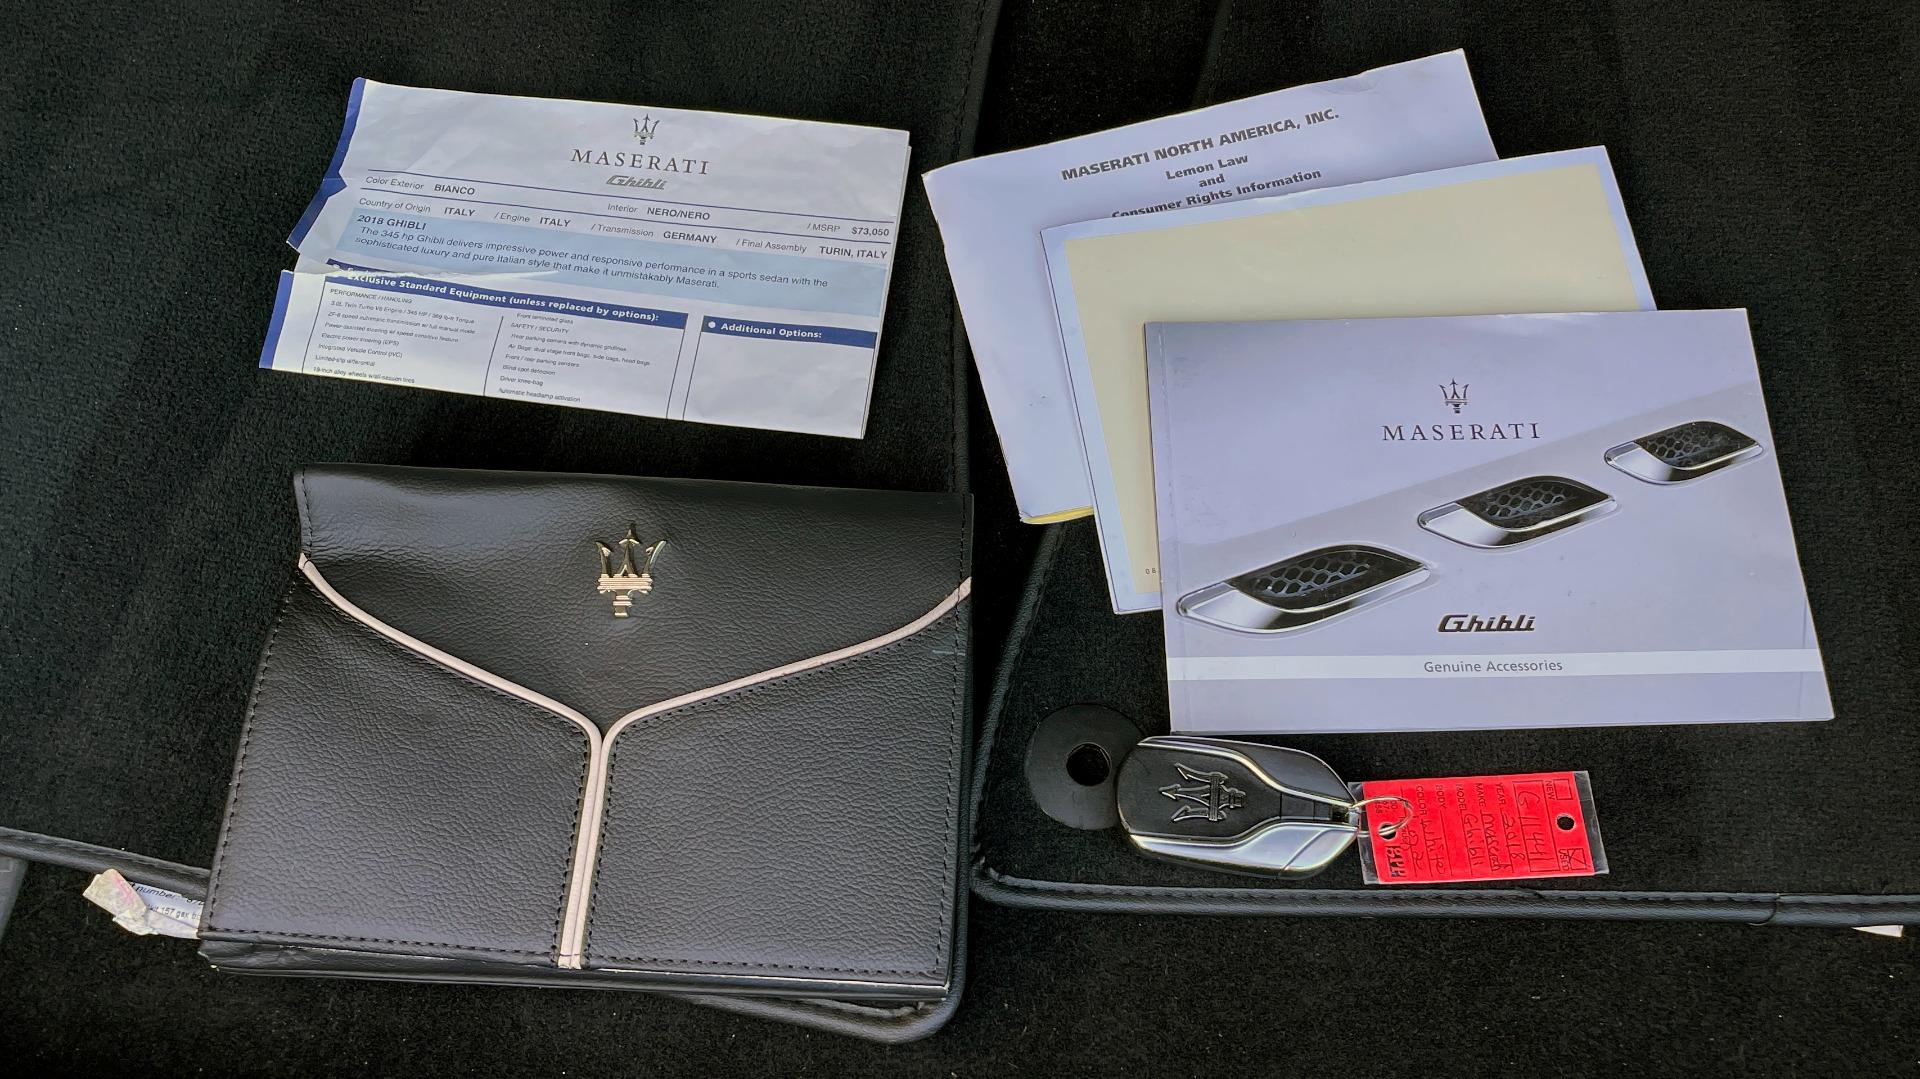 Used 2018 Maserati GHIBLI SEDAN / RWD / 3.0L V6 / SUNROOF / NAV / REARVIEW for sale $42,995 at Formula Imports in Charlotte NC 28227 67